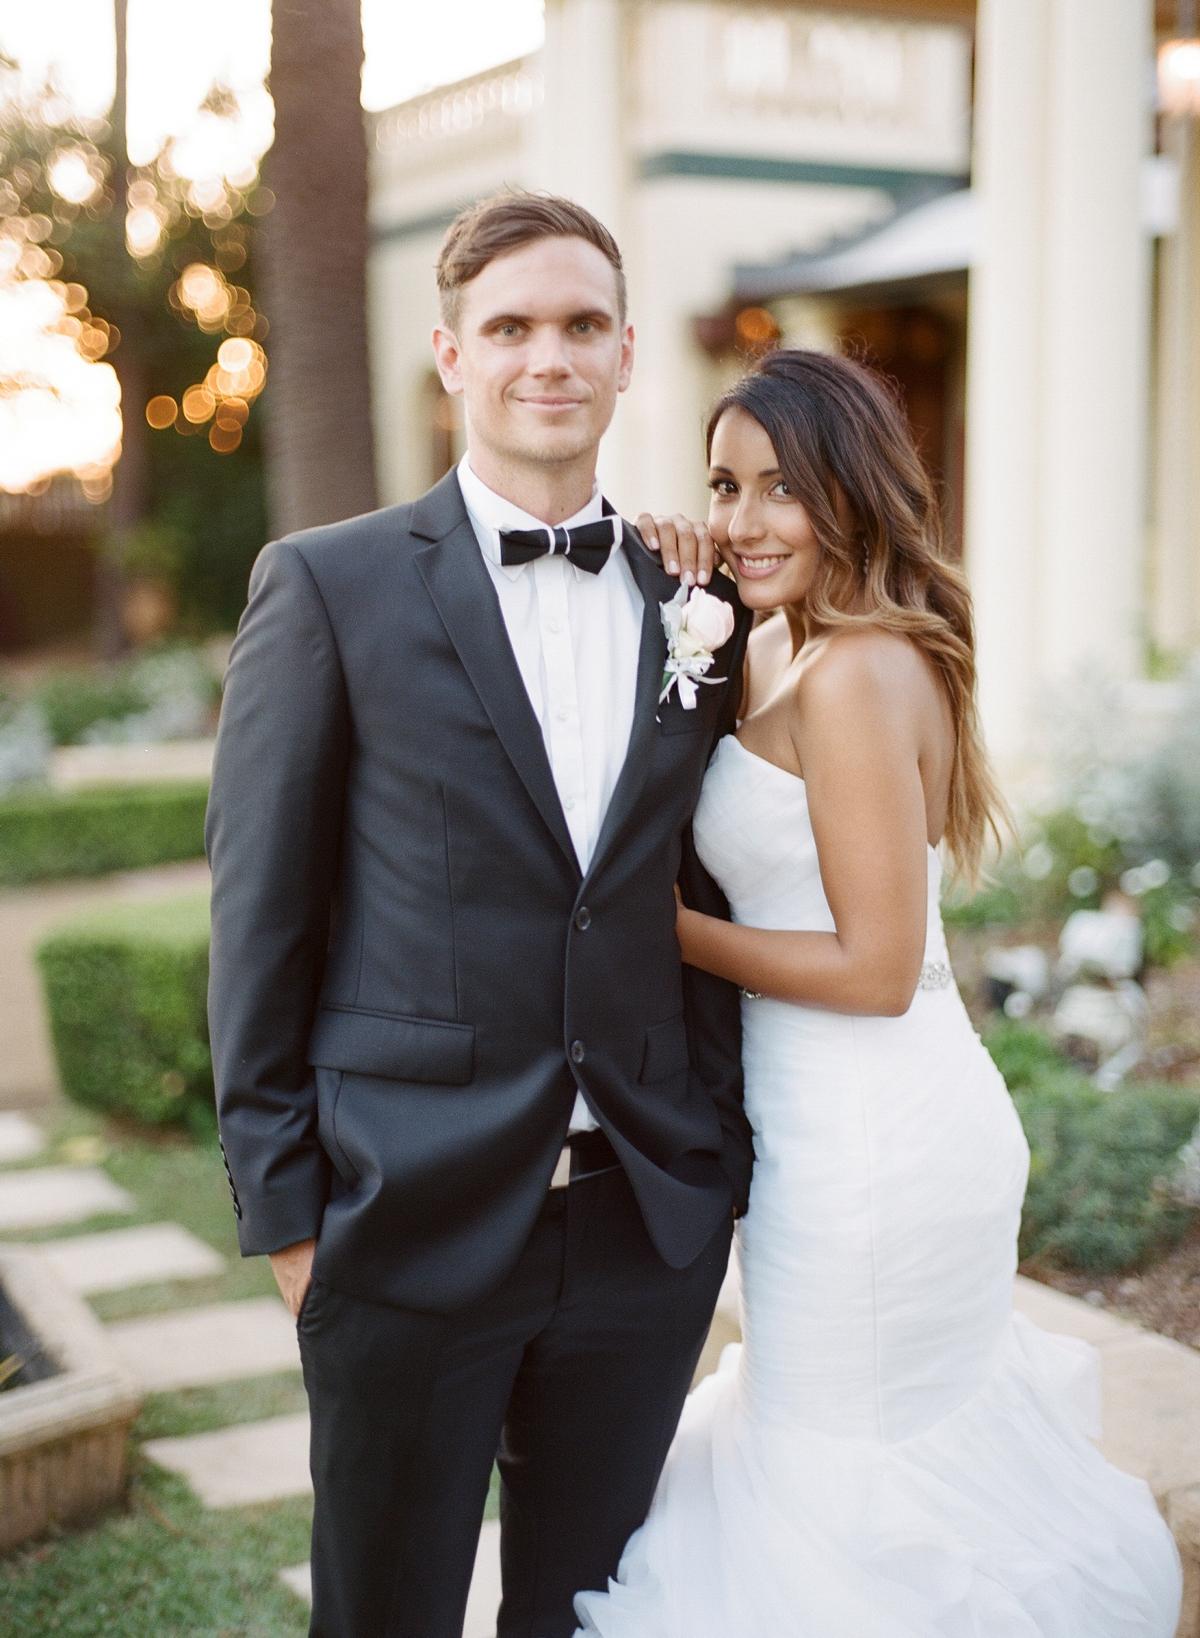 Jaryd and Sarah's Sydney Wedding by Mr Edwards Photography_2341.jpg